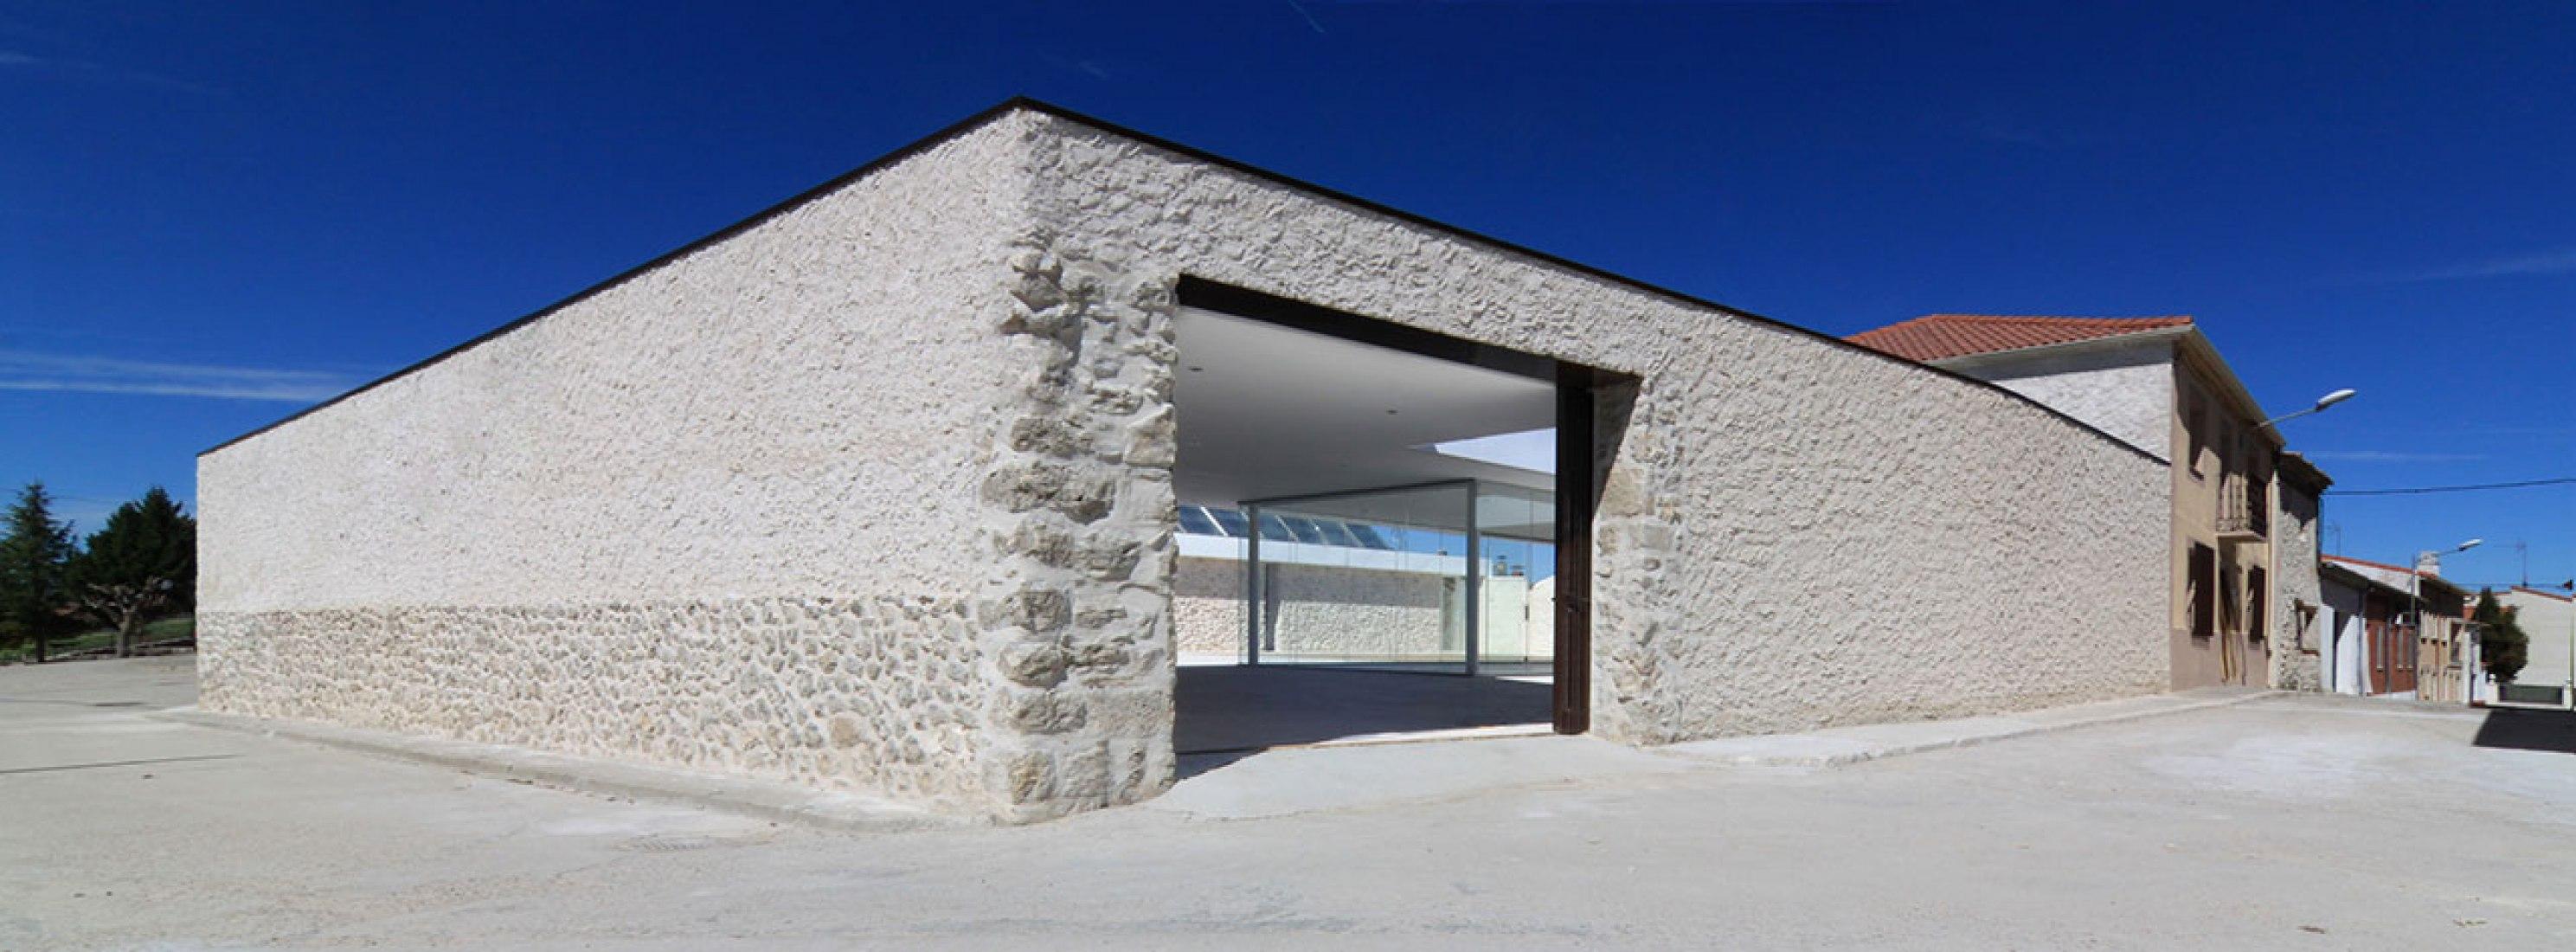 Access view. Courtyard in Santibañez by Óscar Miguel Ares Álvarez. Photograph © Jesús J. Ruiz Alonso.